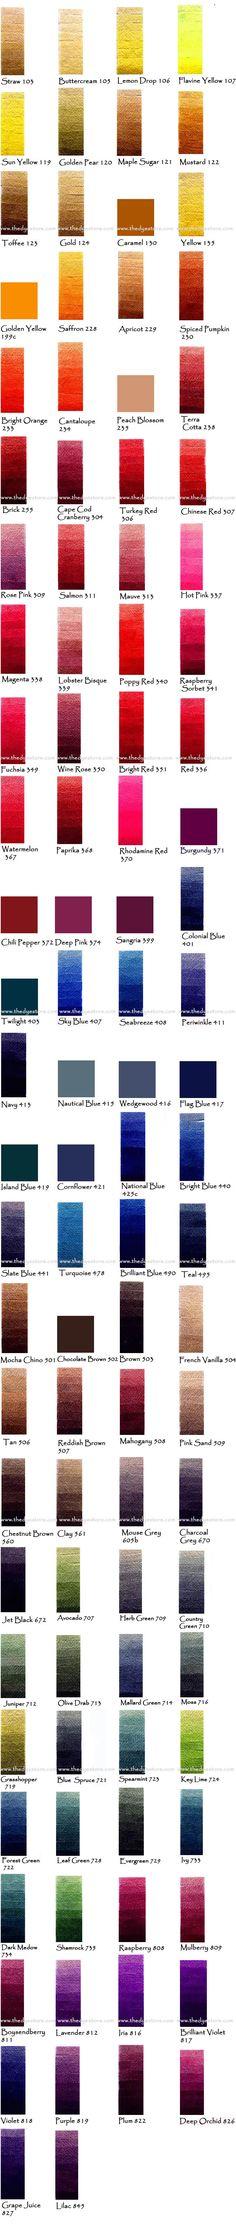 ProChem Colors